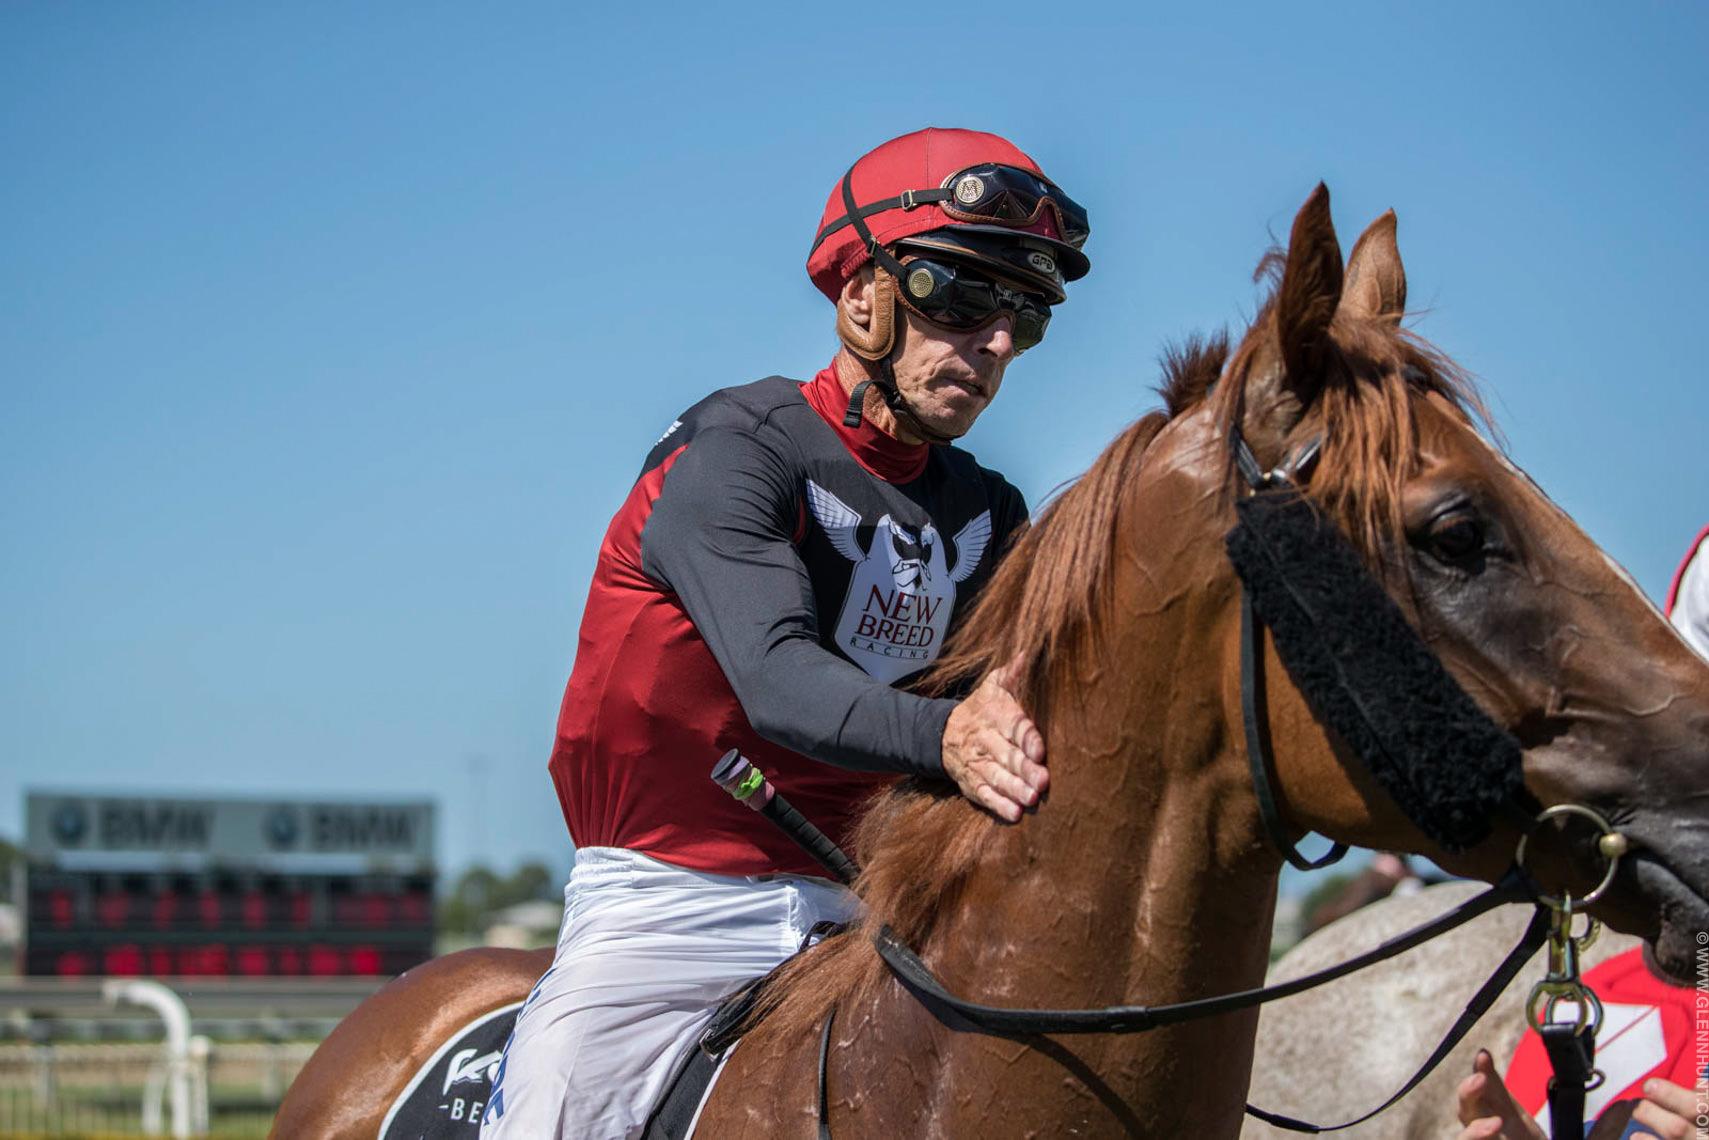 Brisbane Horse Racing